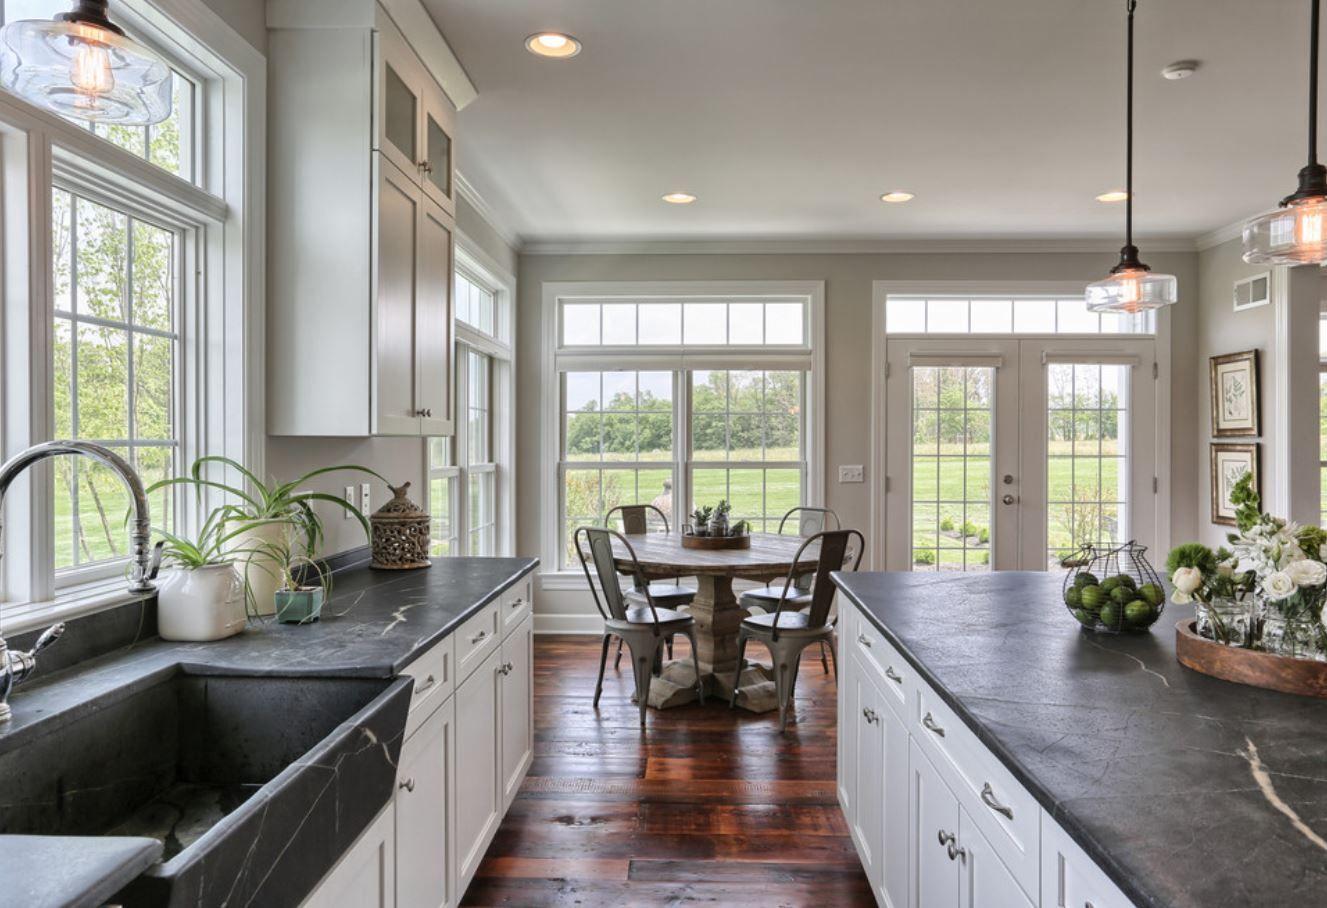 Soapstone countertops, windows, PERFECT | Kitchen ideas | Pinterest ...